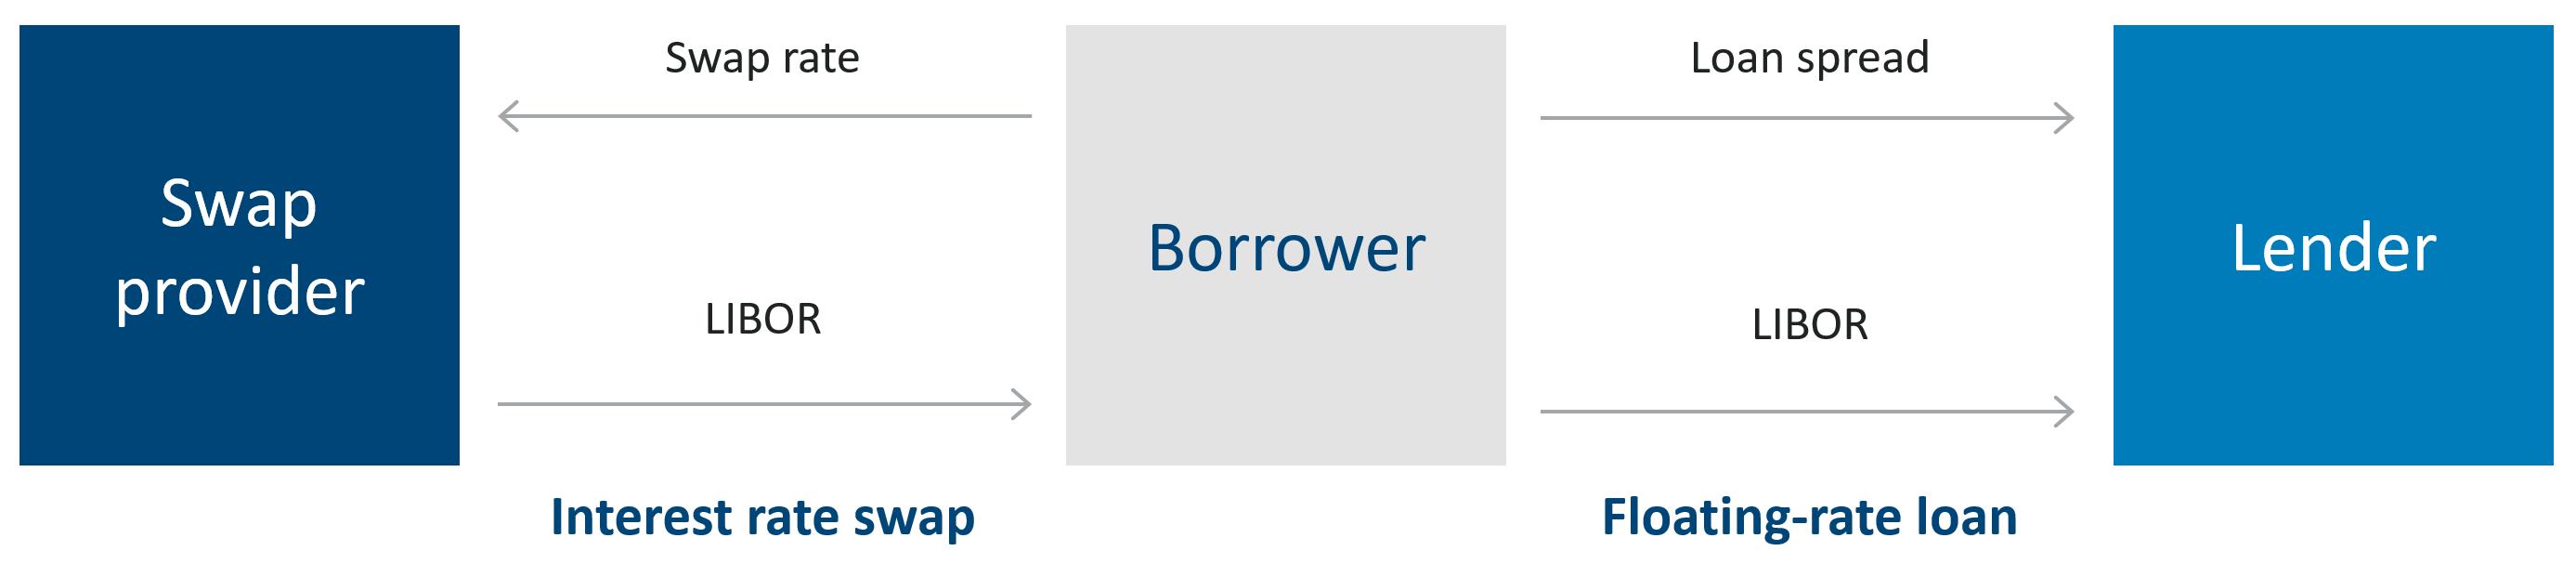 Interest rate swap diagram